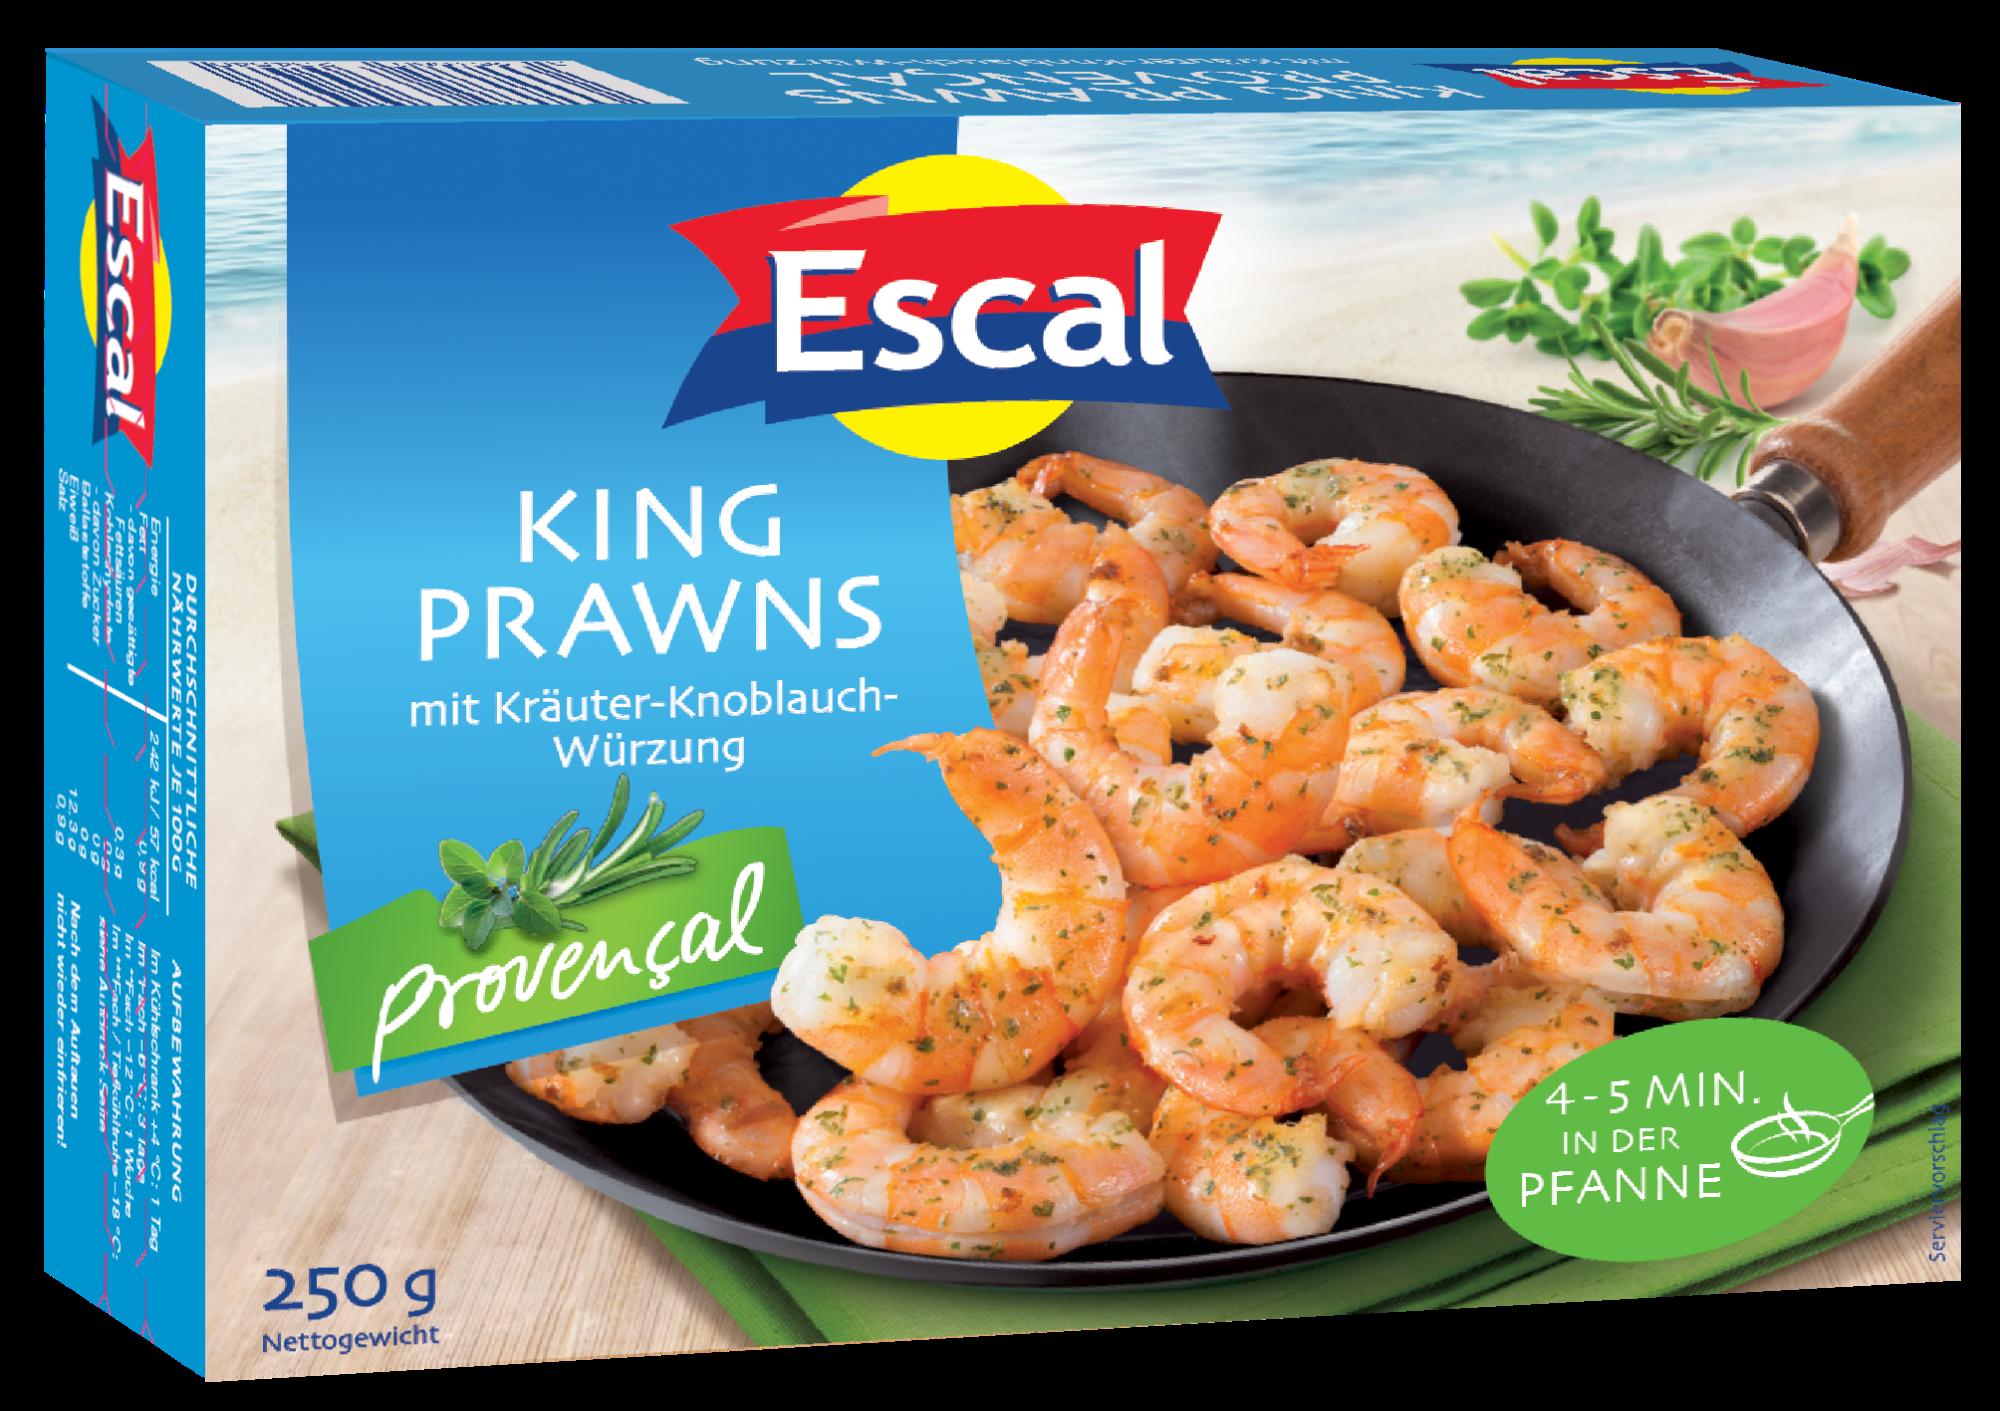 Marinuotos baltakojės blyškiosios krevetės Provencal ESCAL, 250g